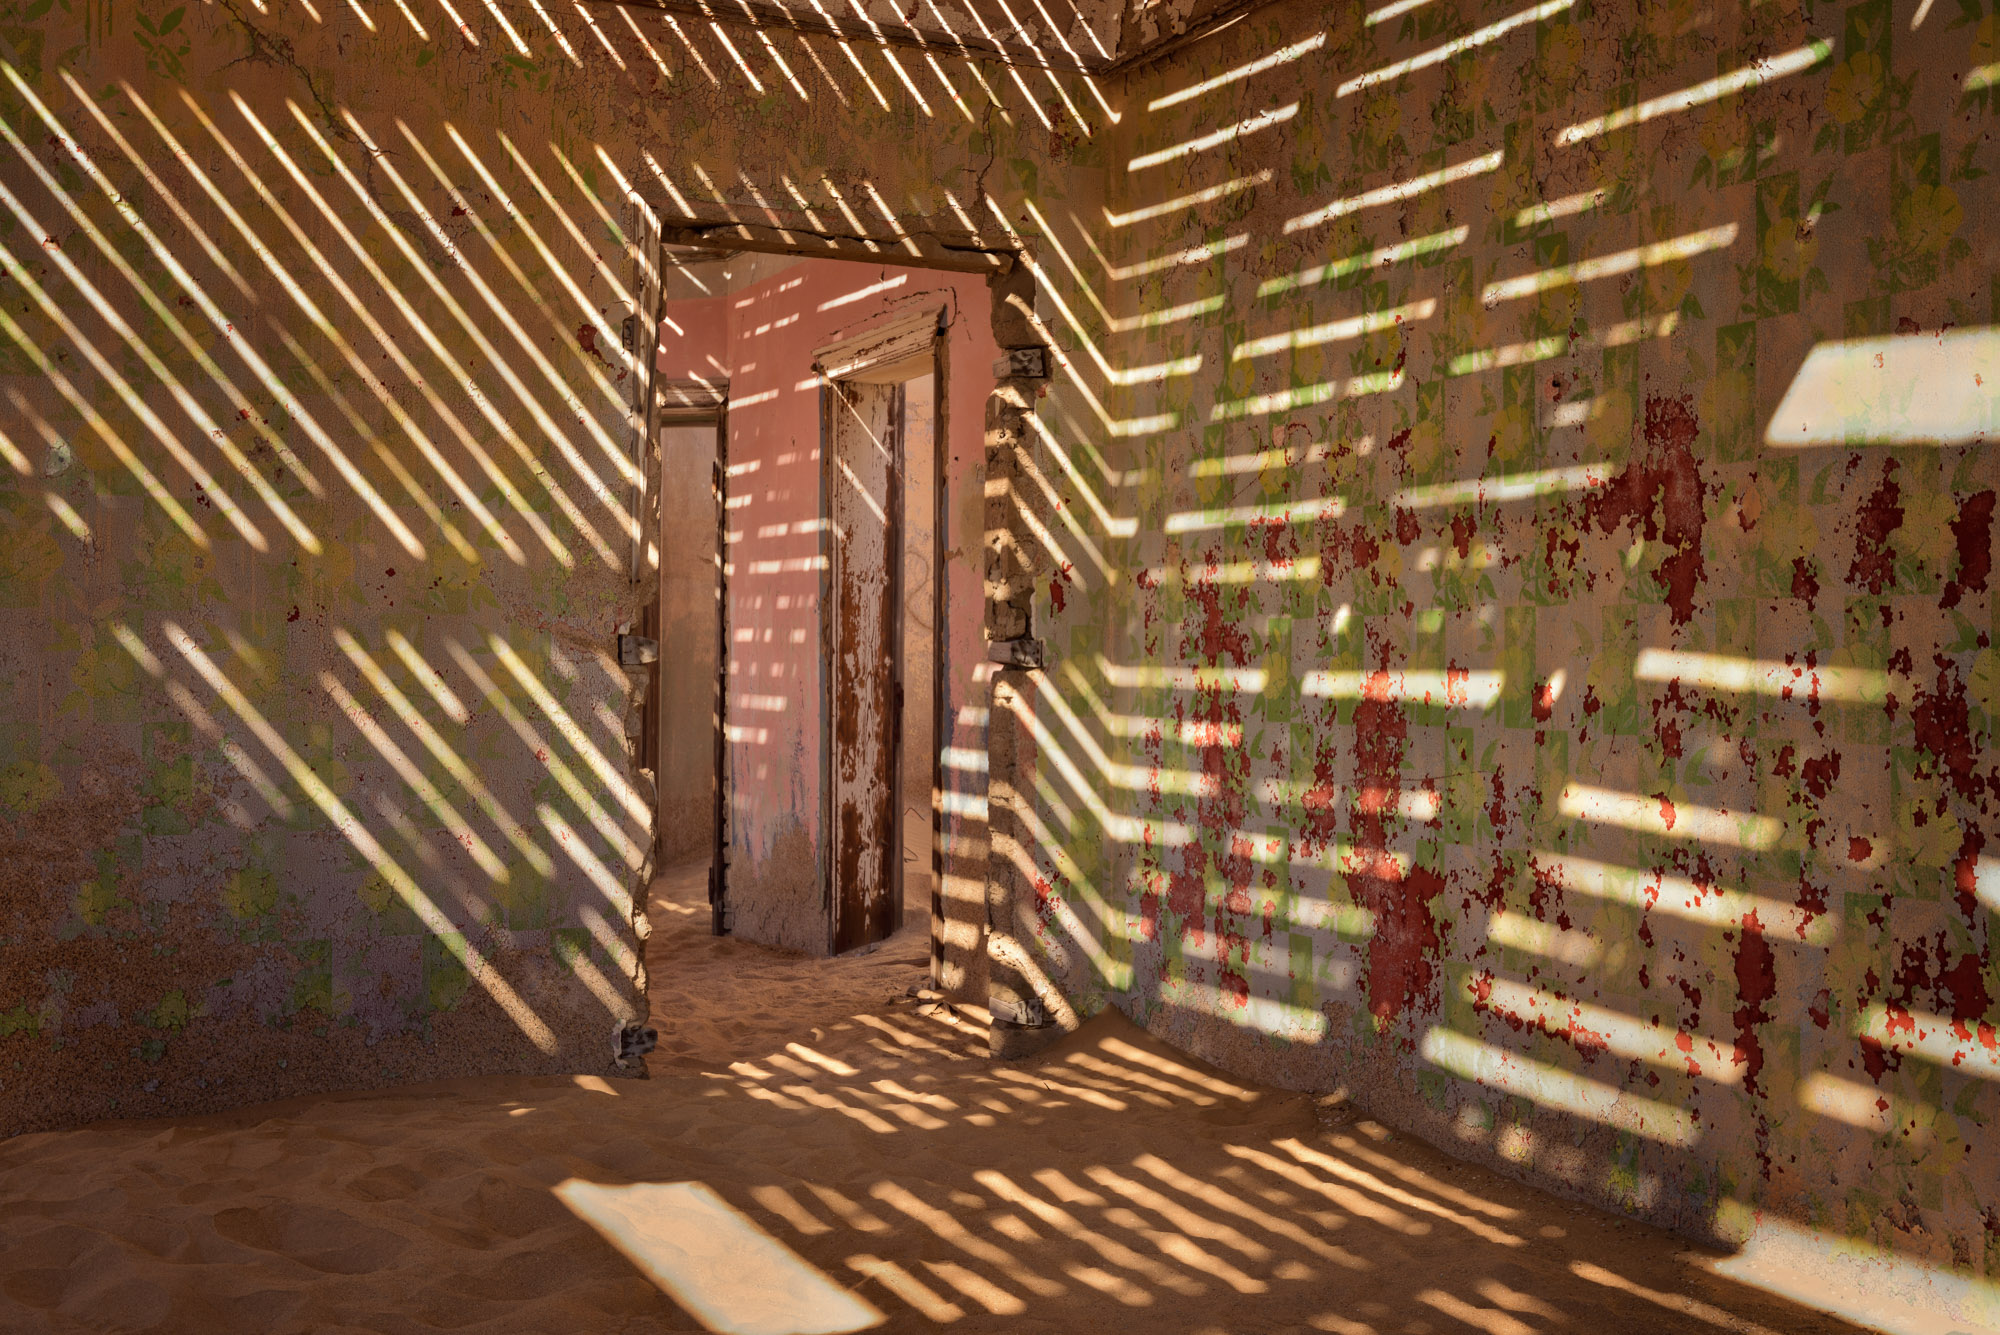 Interior of an Abandoned House, Kolmanskop, Namibia